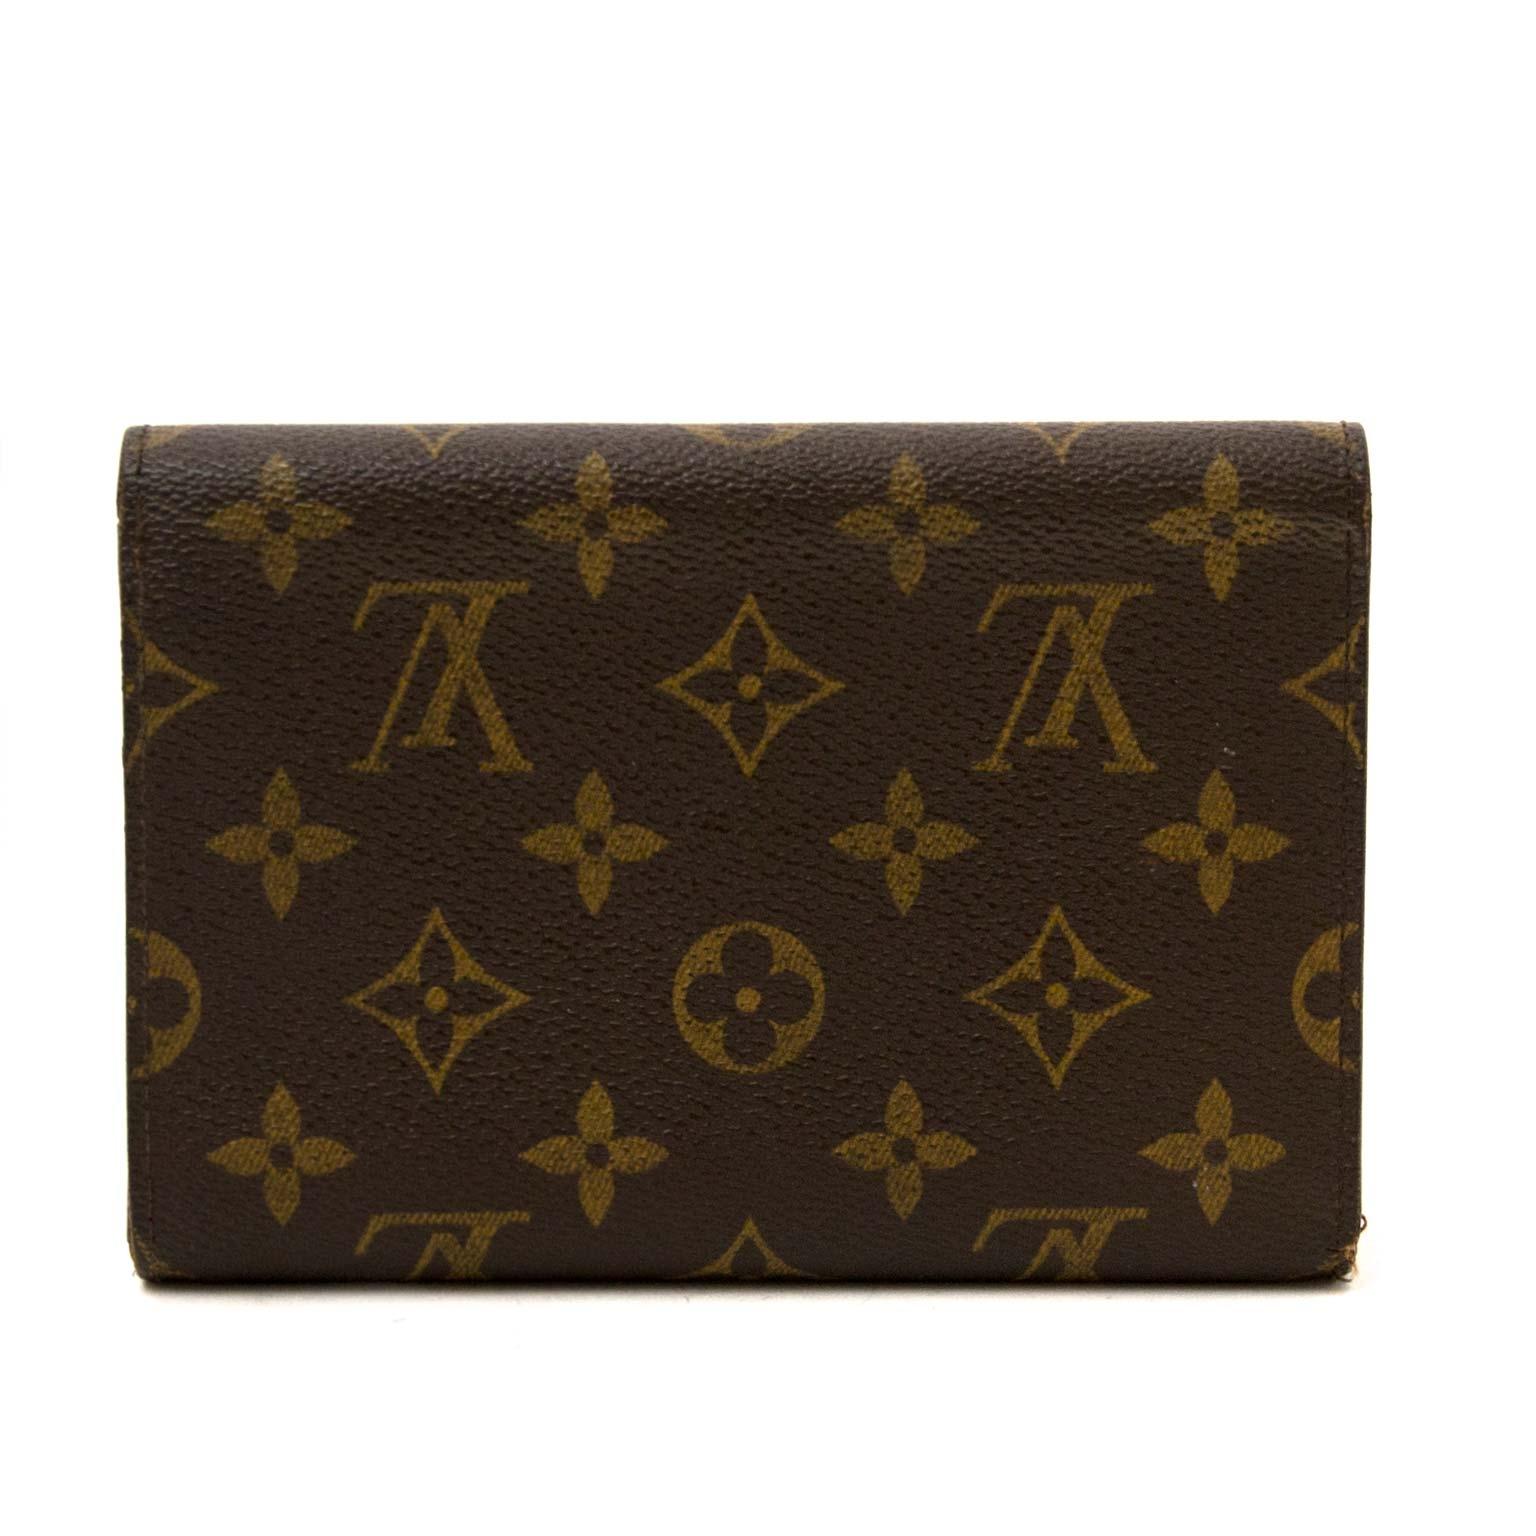 koop authentieke louis vuitton monogram portefeuille nu online bij labellov vintage mode webshop belgië